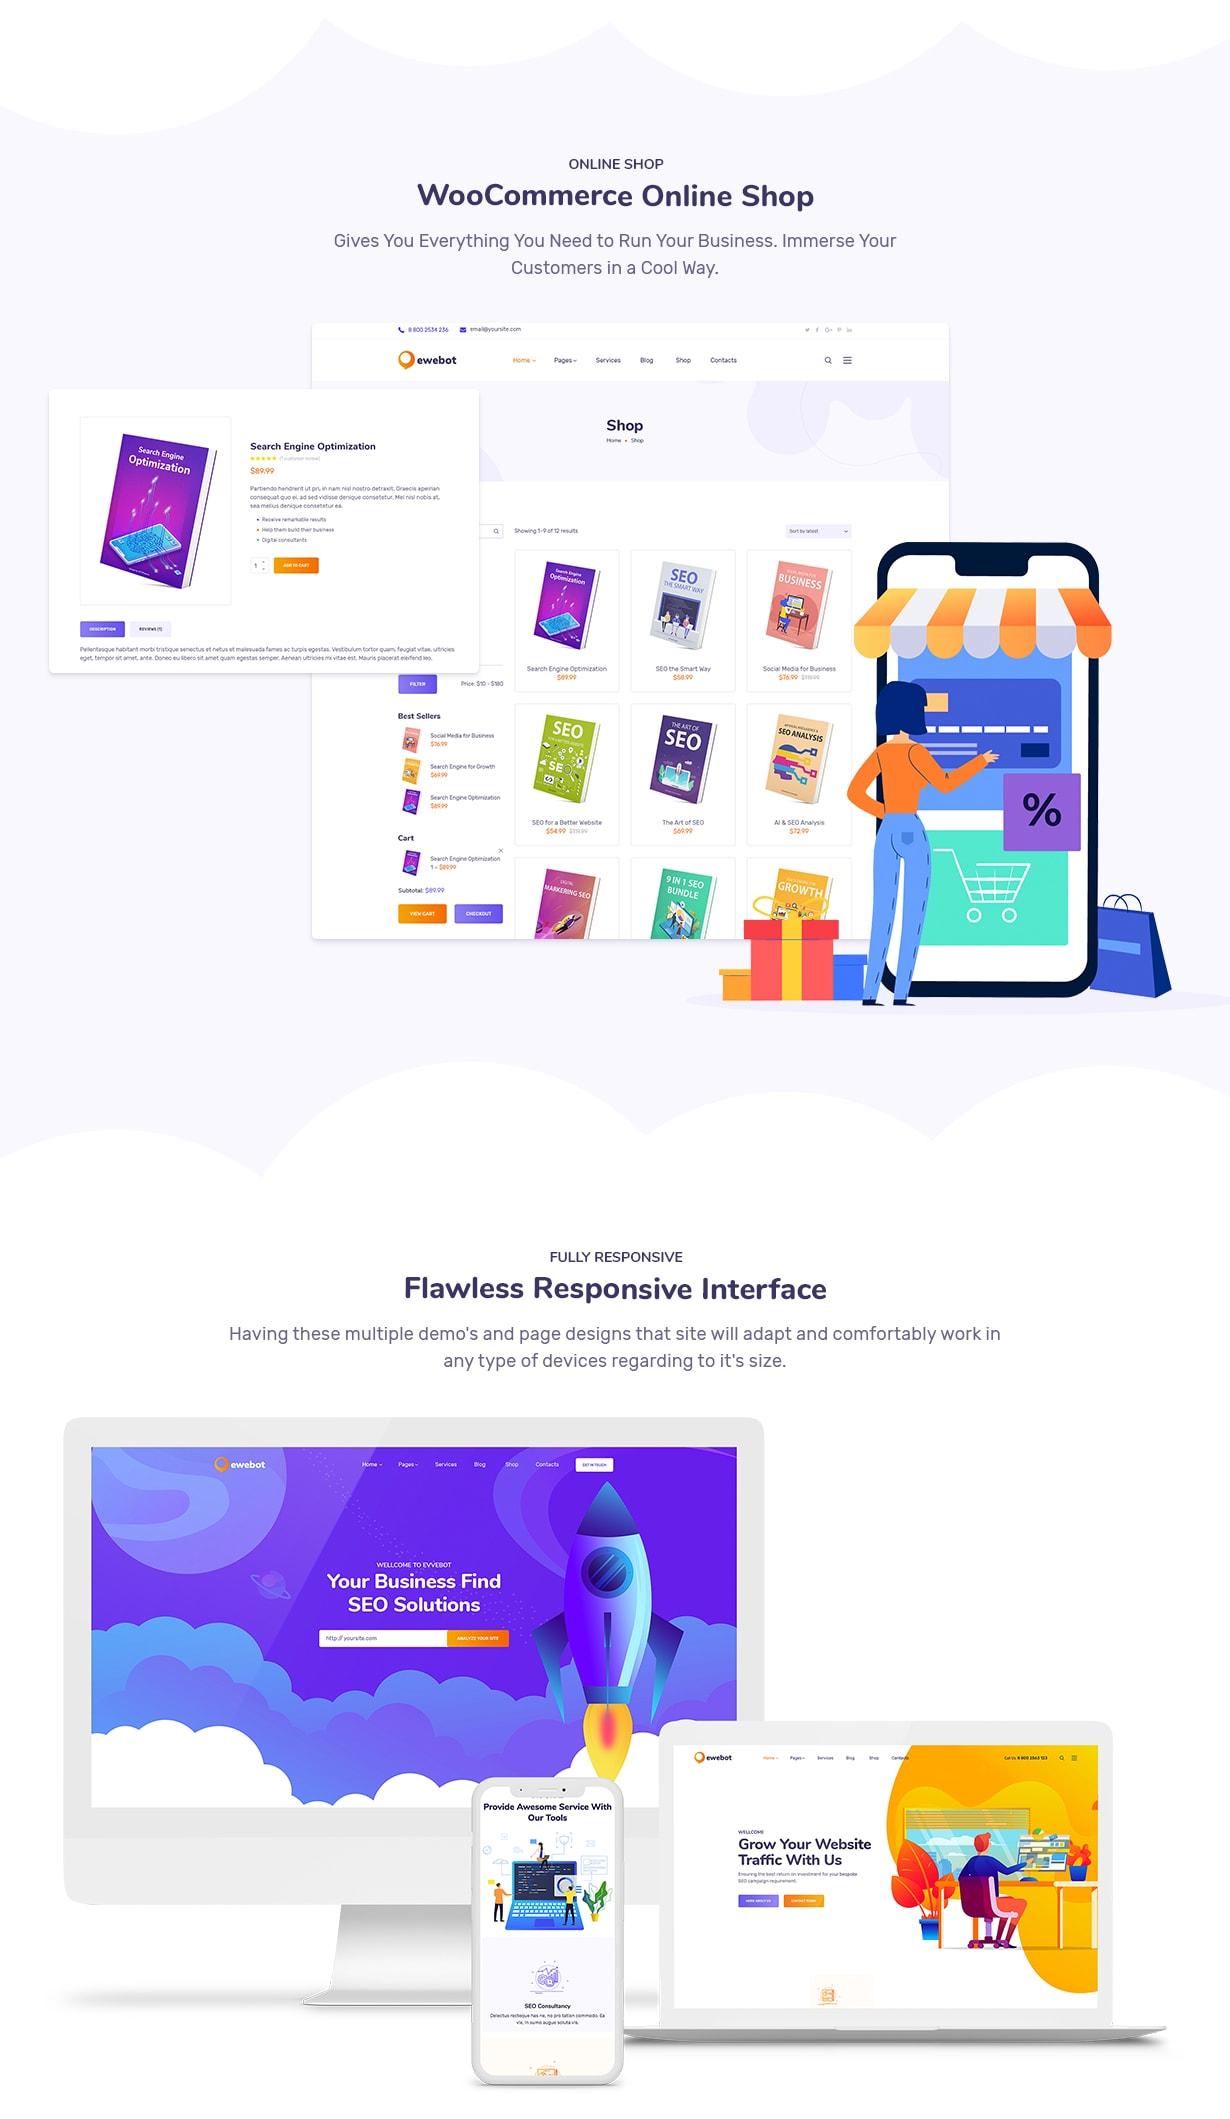 ewebot wp4 - Ewebot - SEO Marketing & Digital Agency